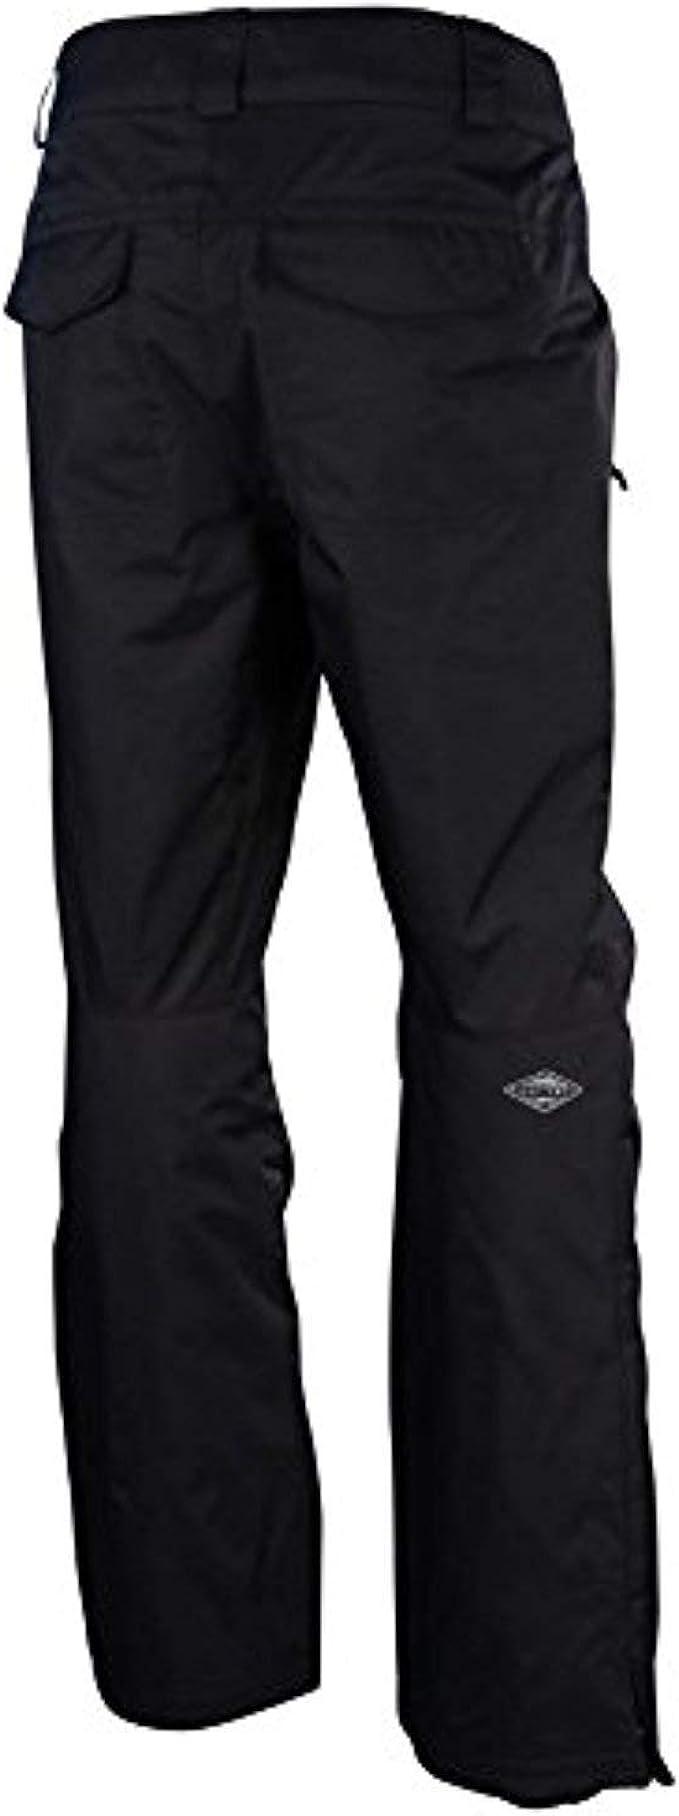 Black M 10//12 Columbia Youth Kids Arctic Trip Omni-Tech Ski Pants